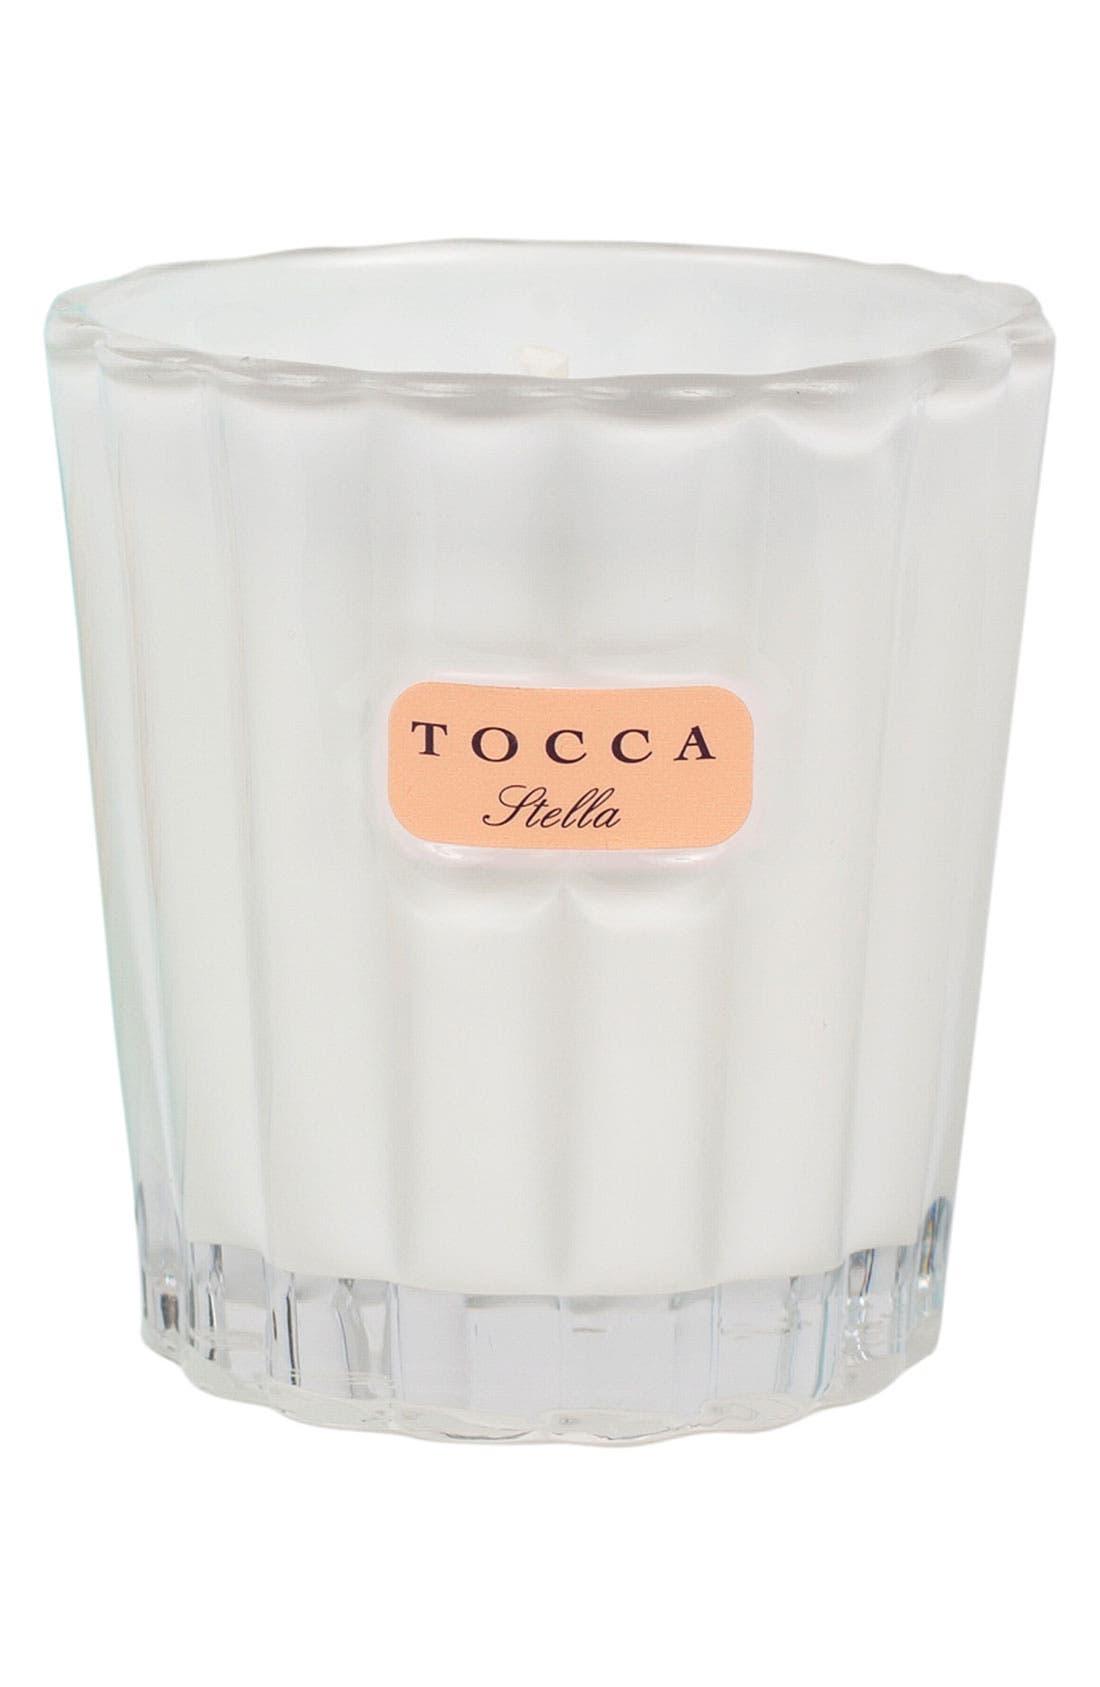 Main Image - TOCCA 'Stella' Candelina